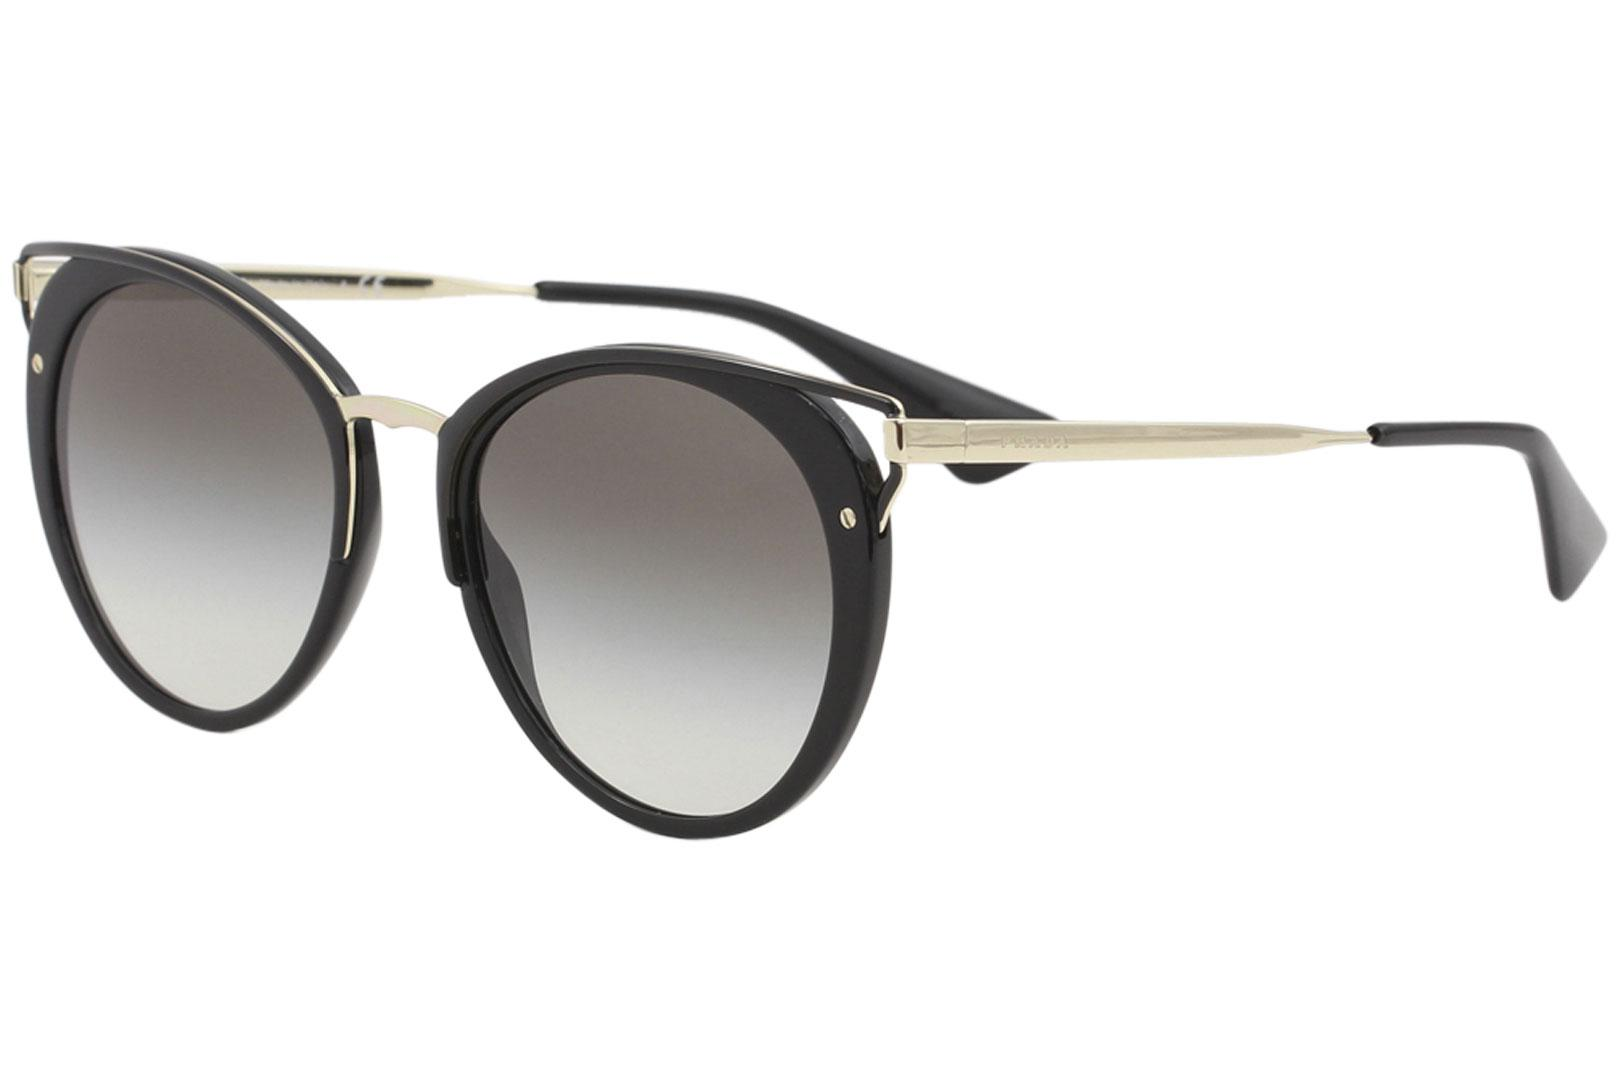 Prada Women's SPR66T SPR/66T Fashion Round Sunglasses